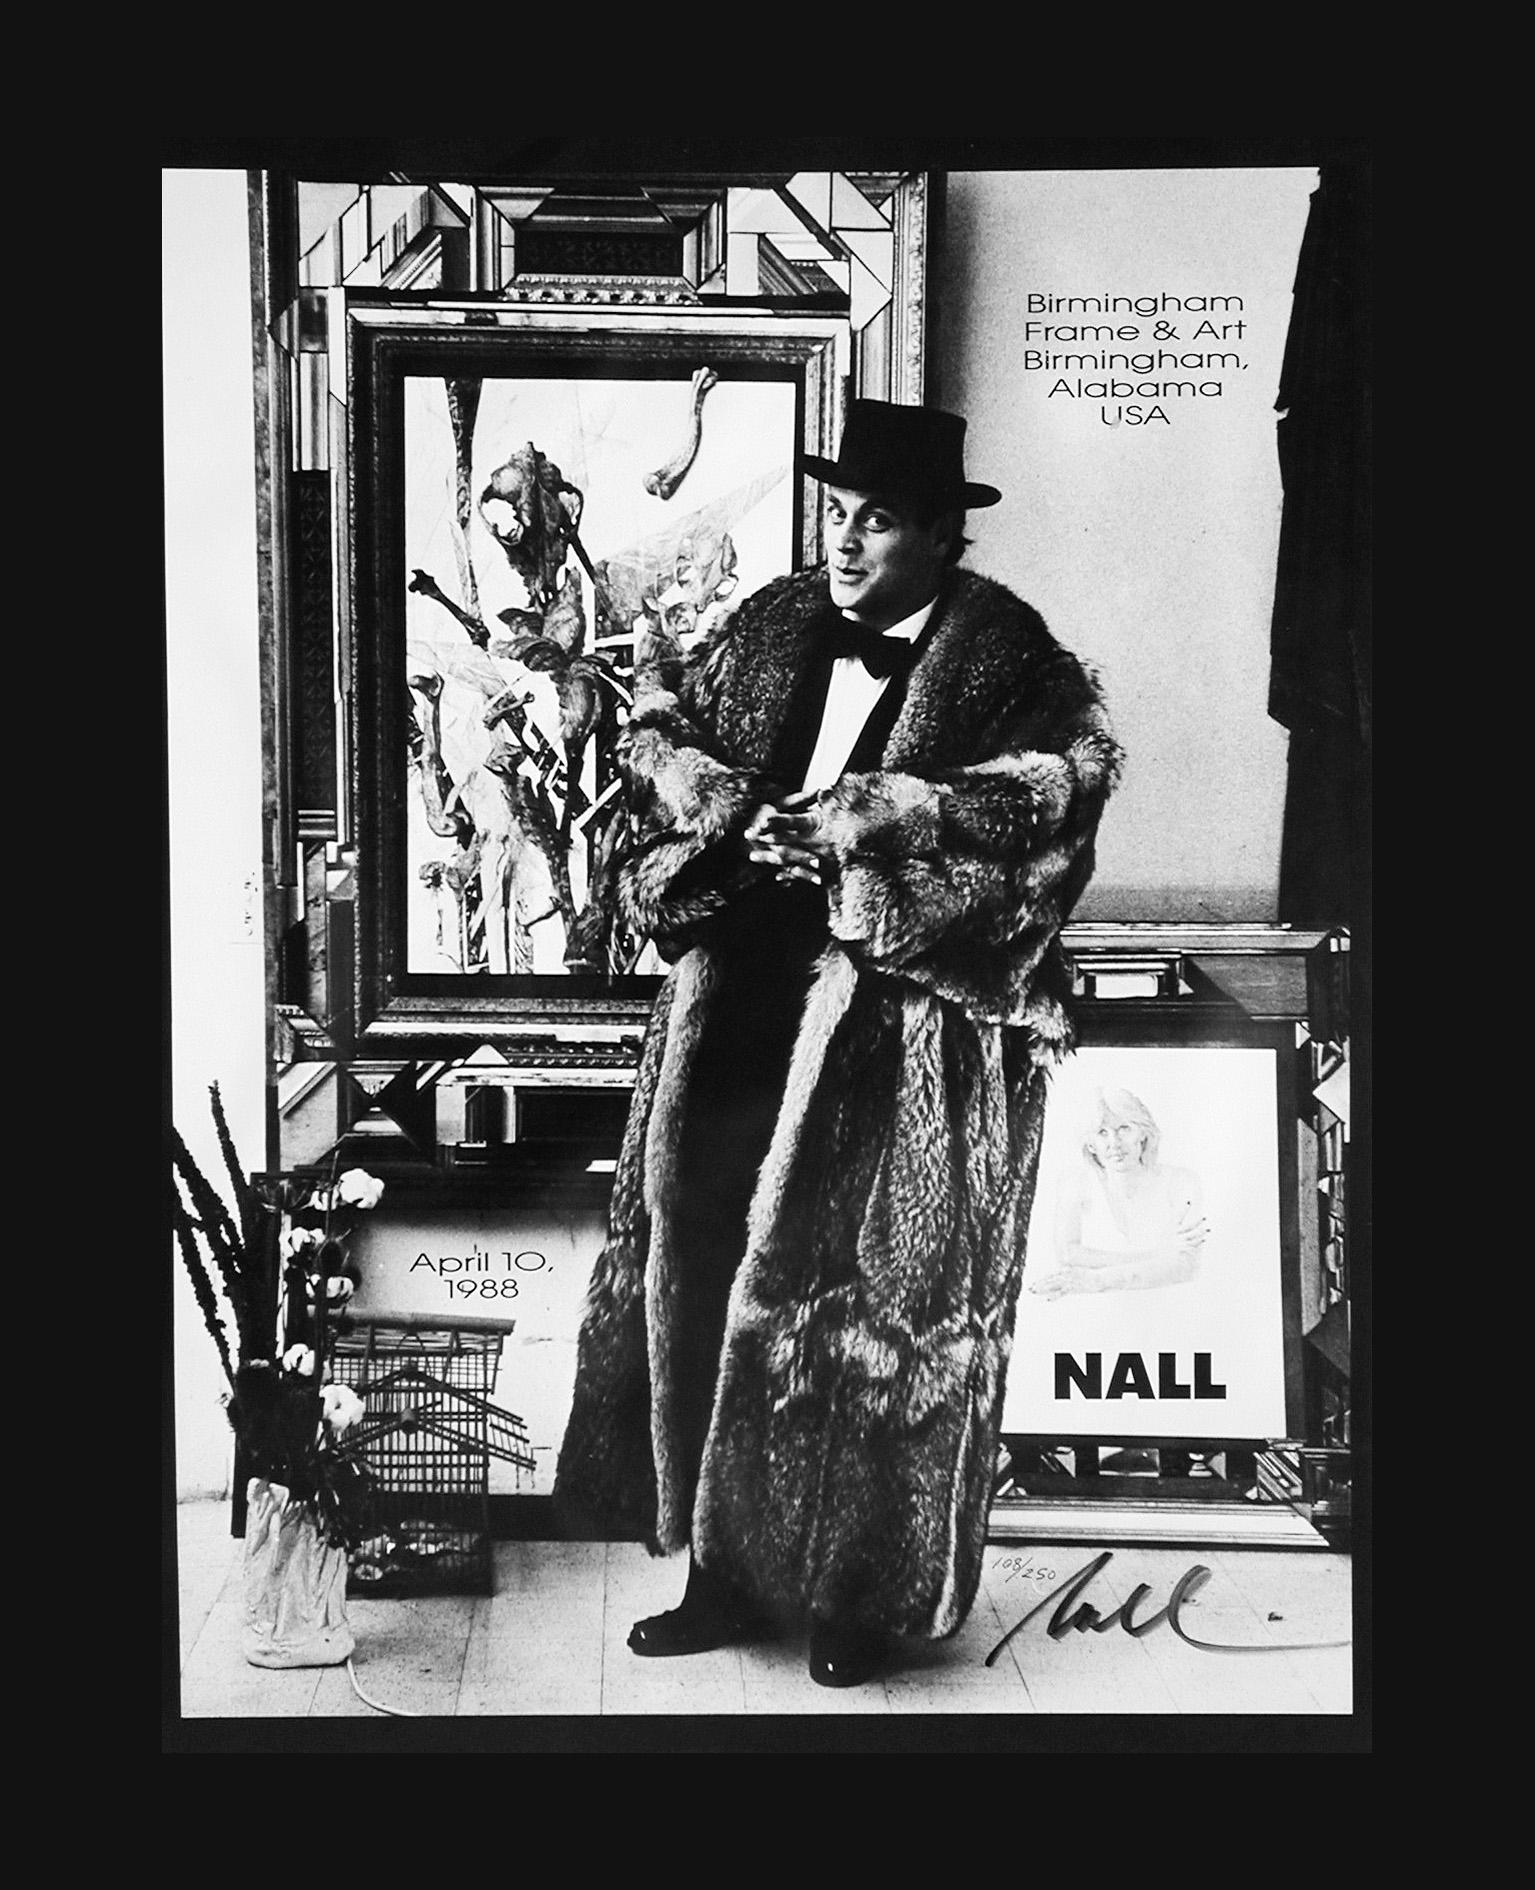 Nall Brimingham - 1988